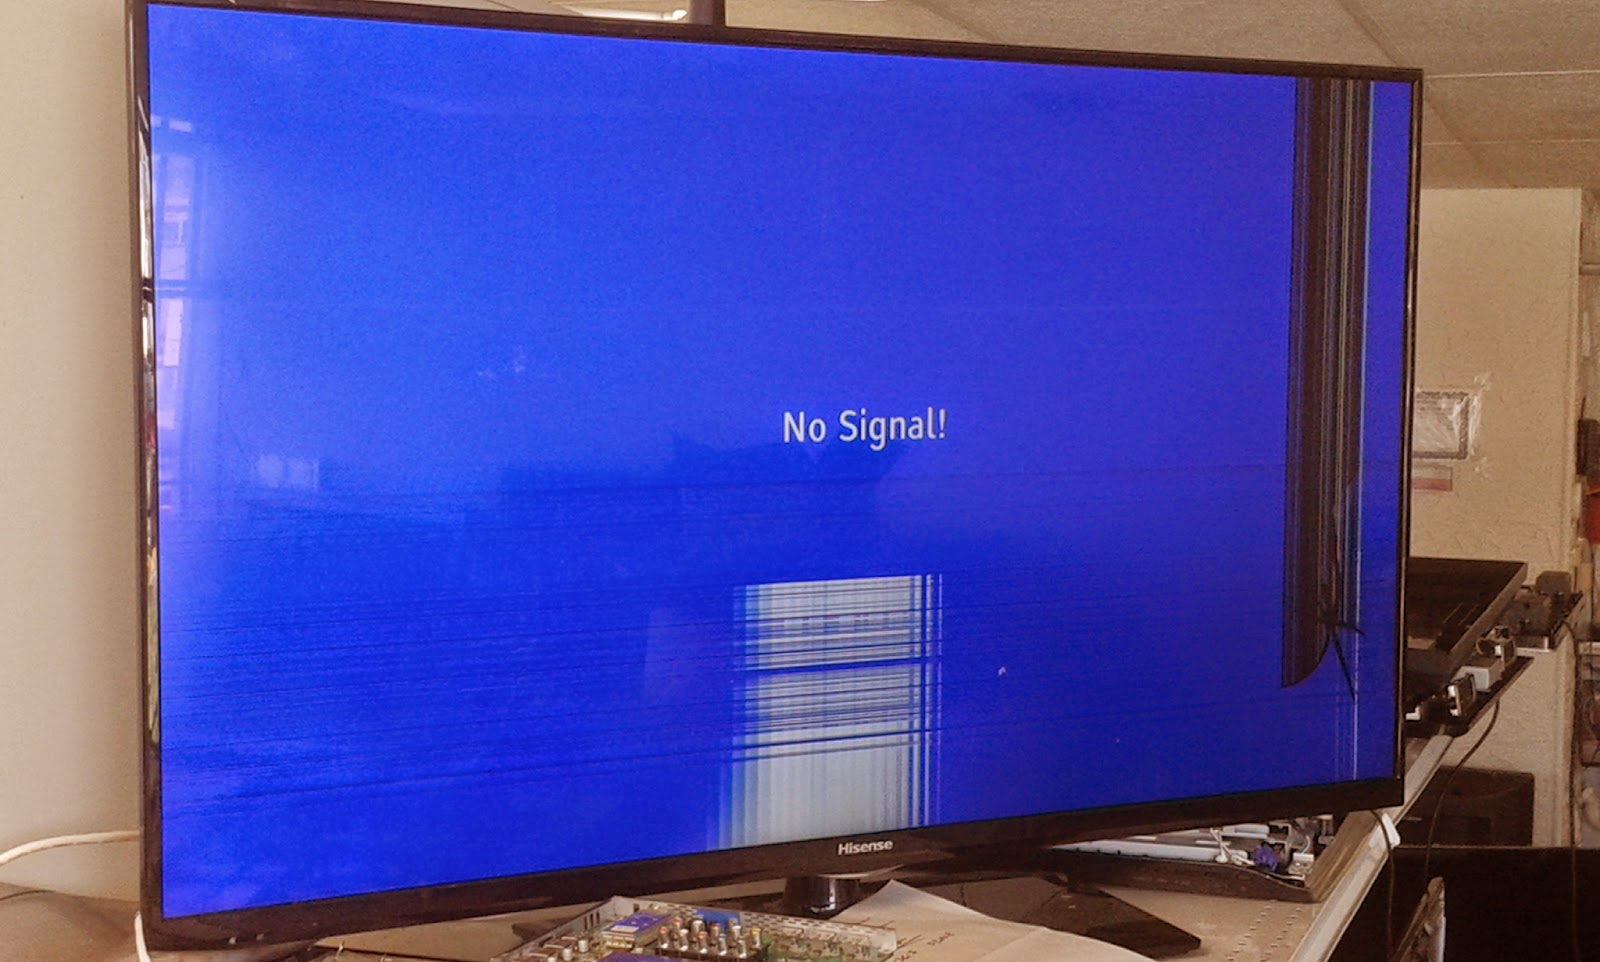 Hisense Tv Backlight Failure